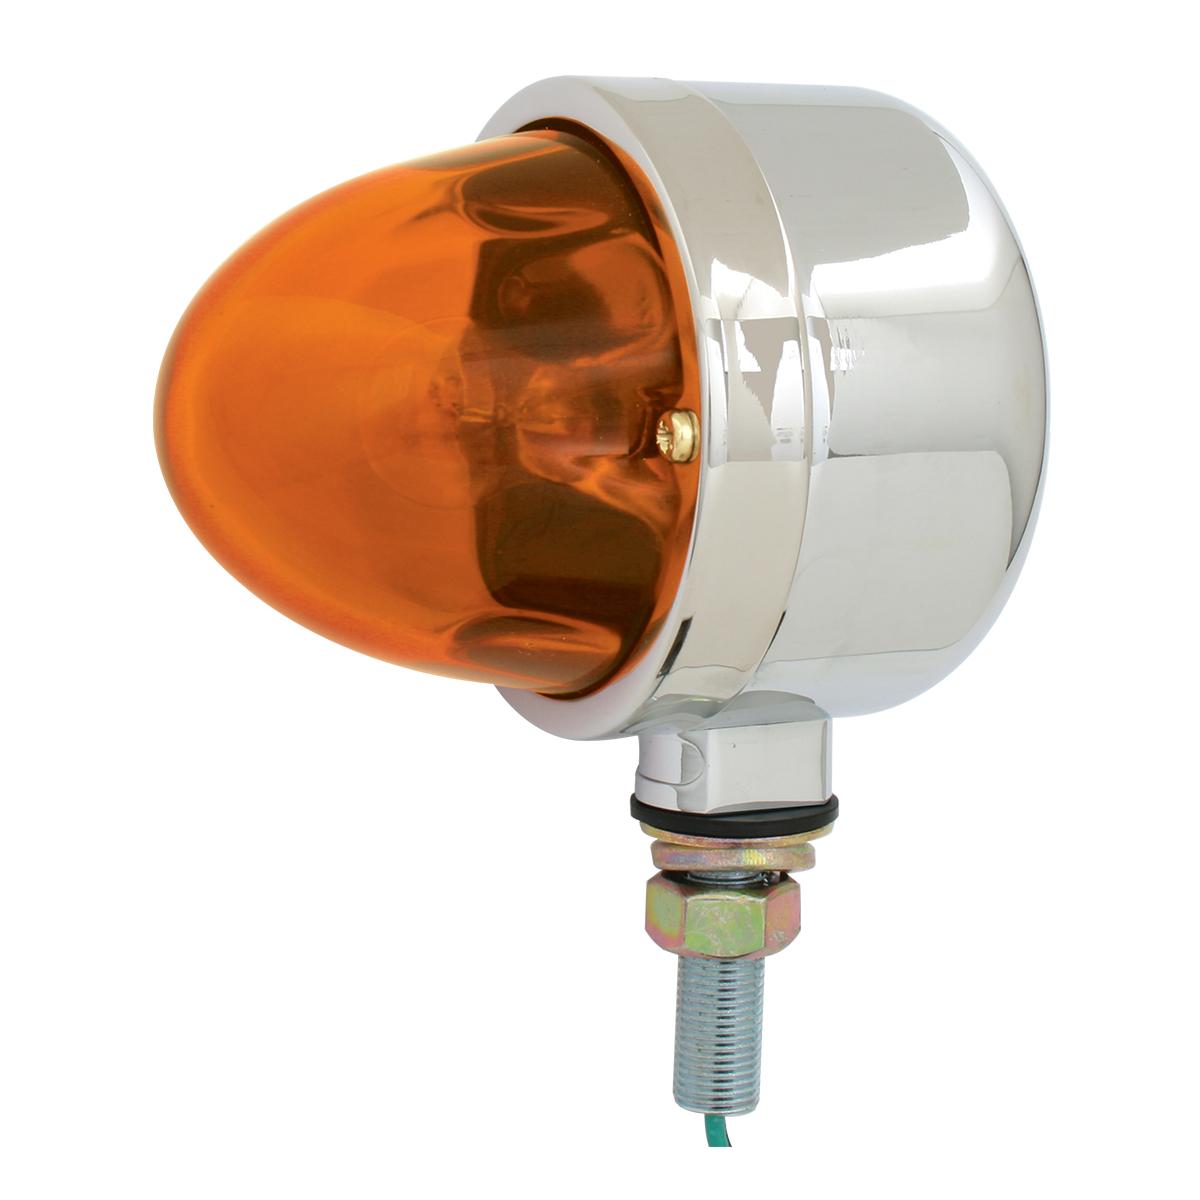 78111 Single Face Chrome Die Cast Auxiliary Light with Glass Lens